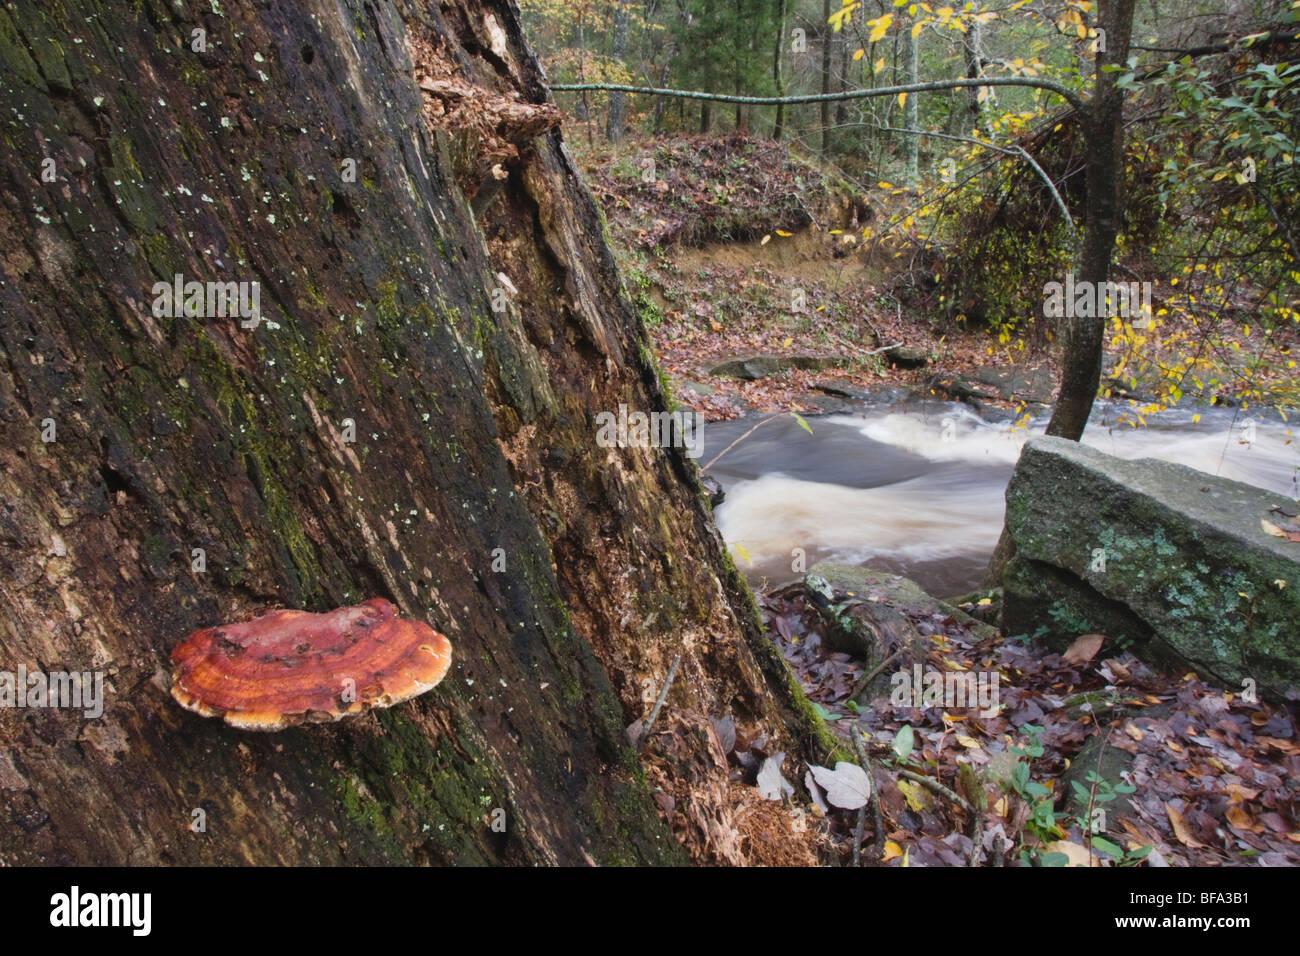 Mustard-Yellow Polypore (Phellinus gilvus) on dead tree, Rolesville Millpond Natural Area, North Carolina, USA - Stock Image